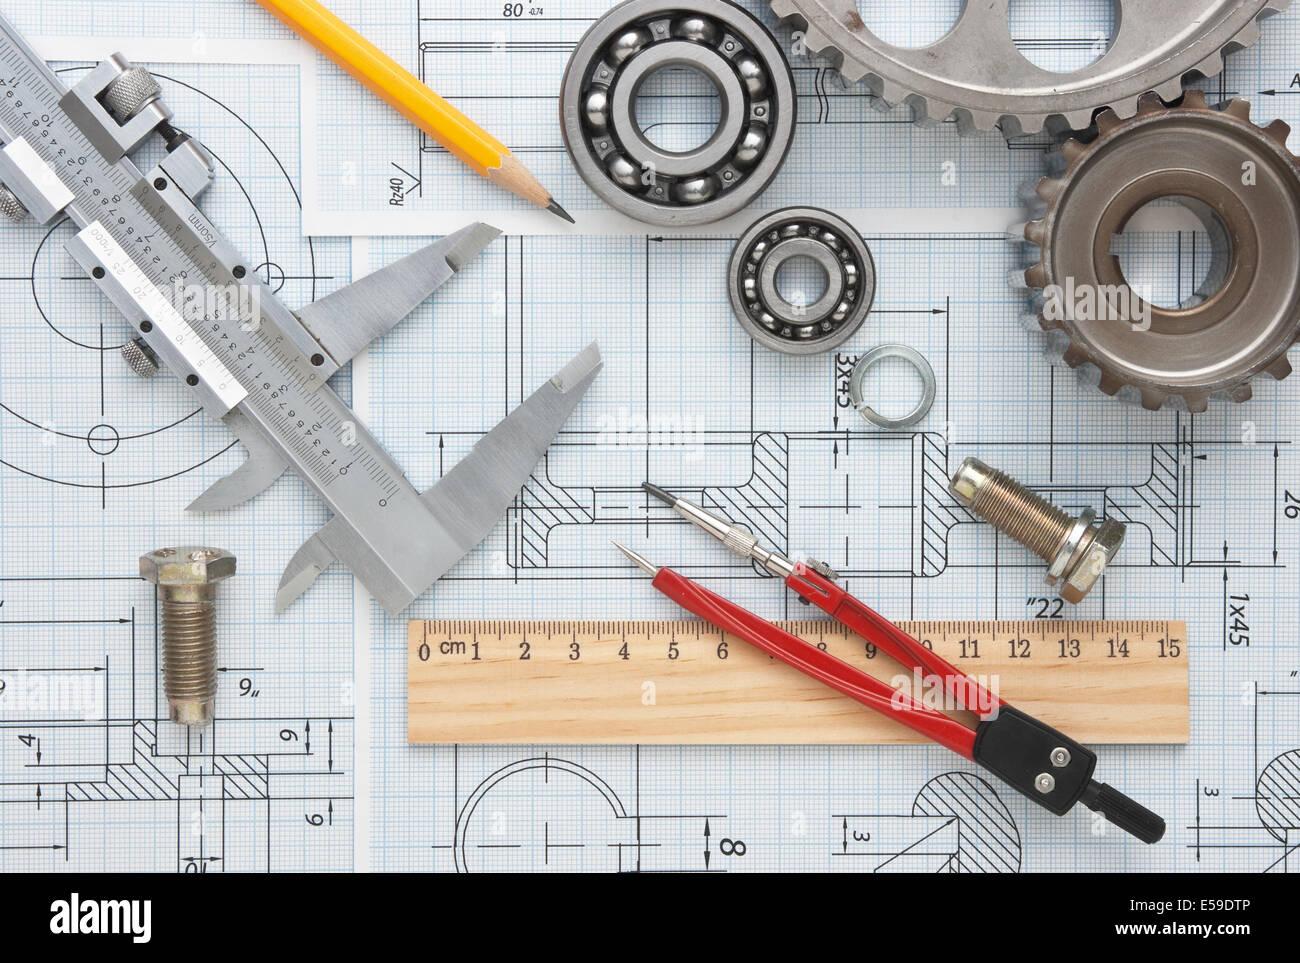 Mechanical Drawing Tools Bearing Stock Photos & Mechanical Drawing ...